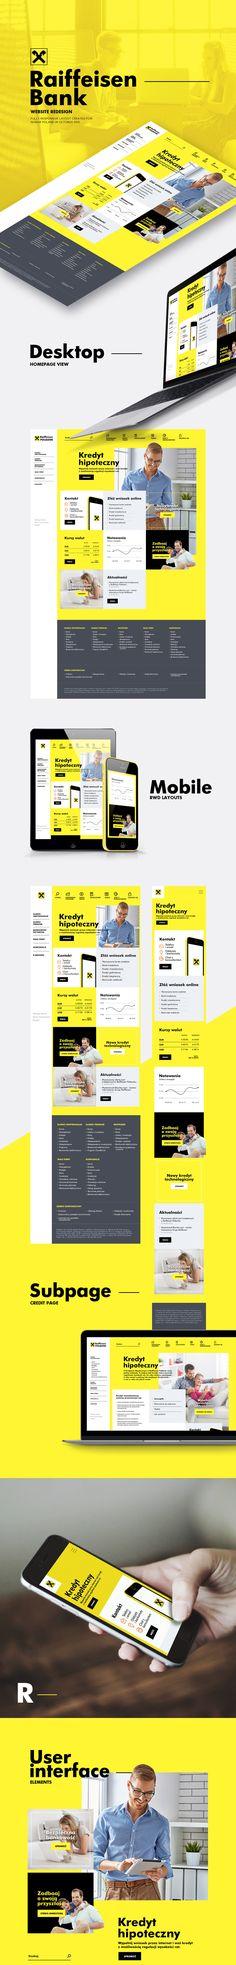 Responsive website design for Raiffeisen Bank// ljackiewicz@gmail.com